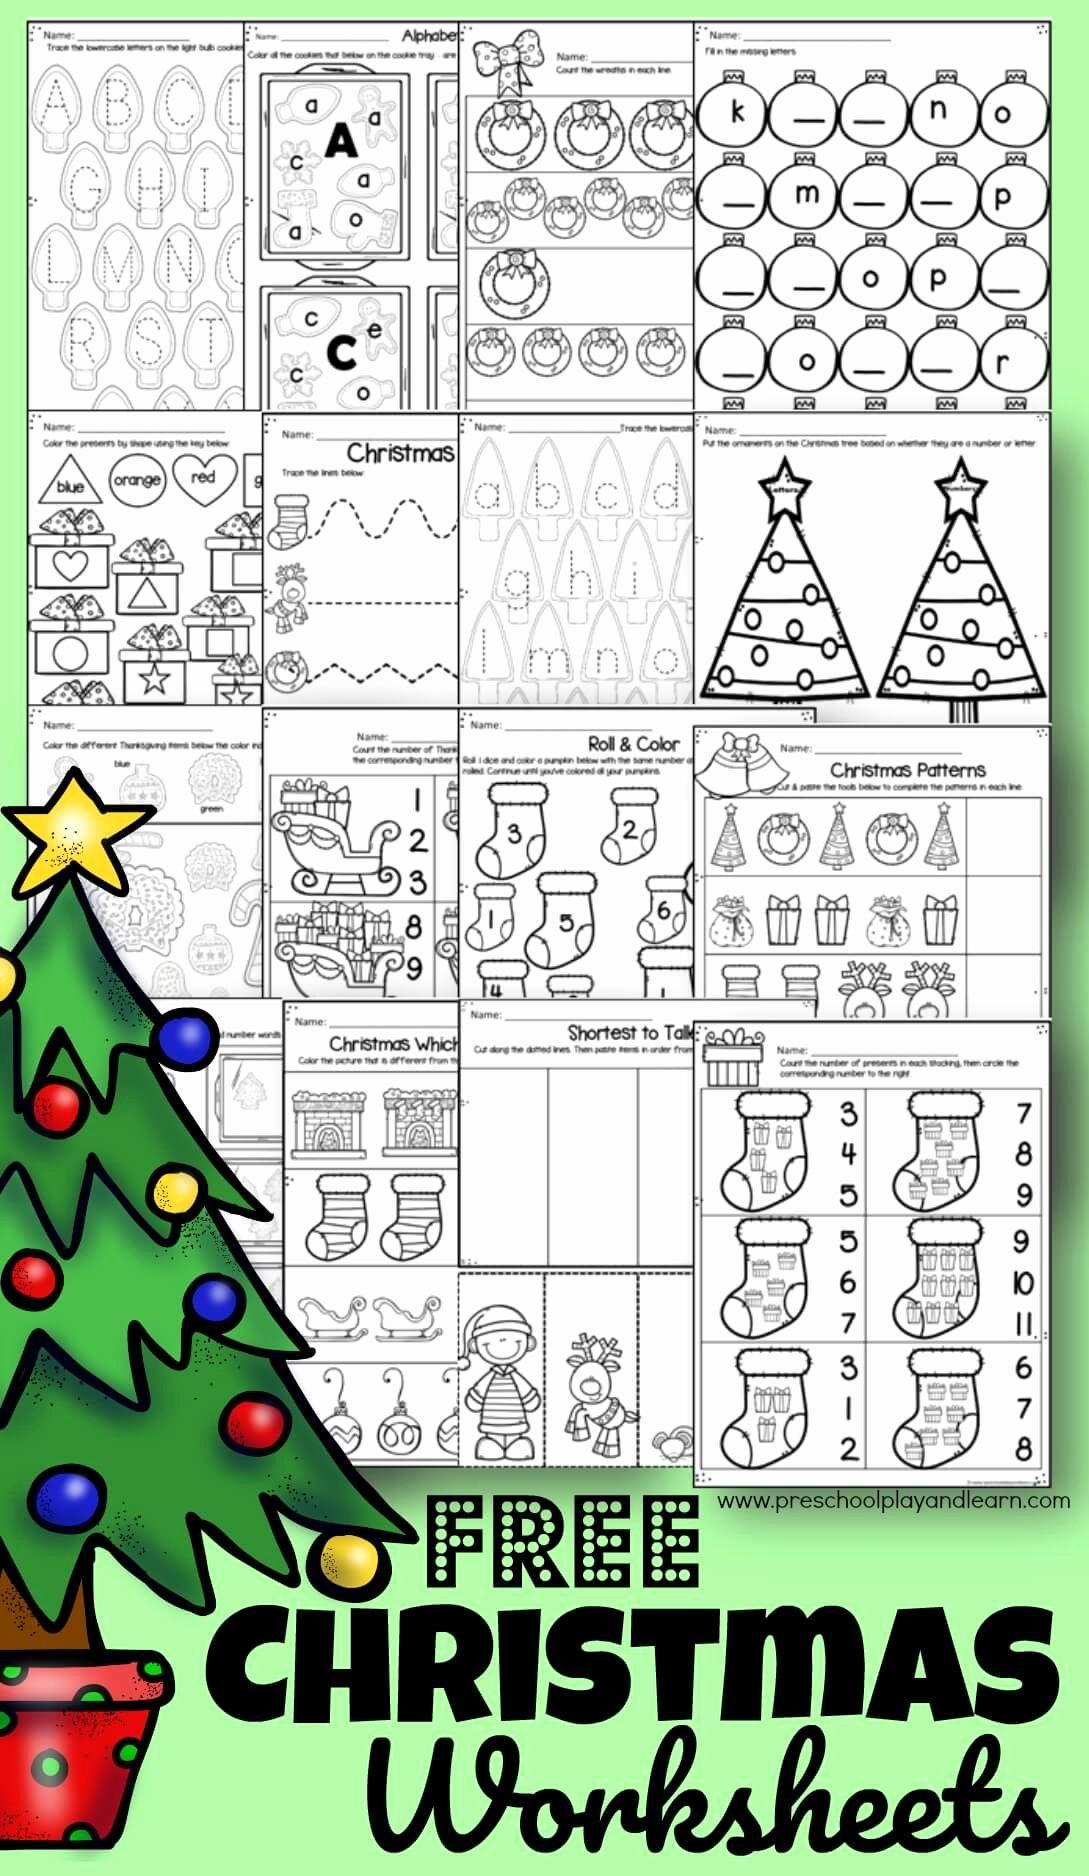 Free Christmas Worksheets for Preschoolers Ideas Free Christmas Worksheets for Preschoolers